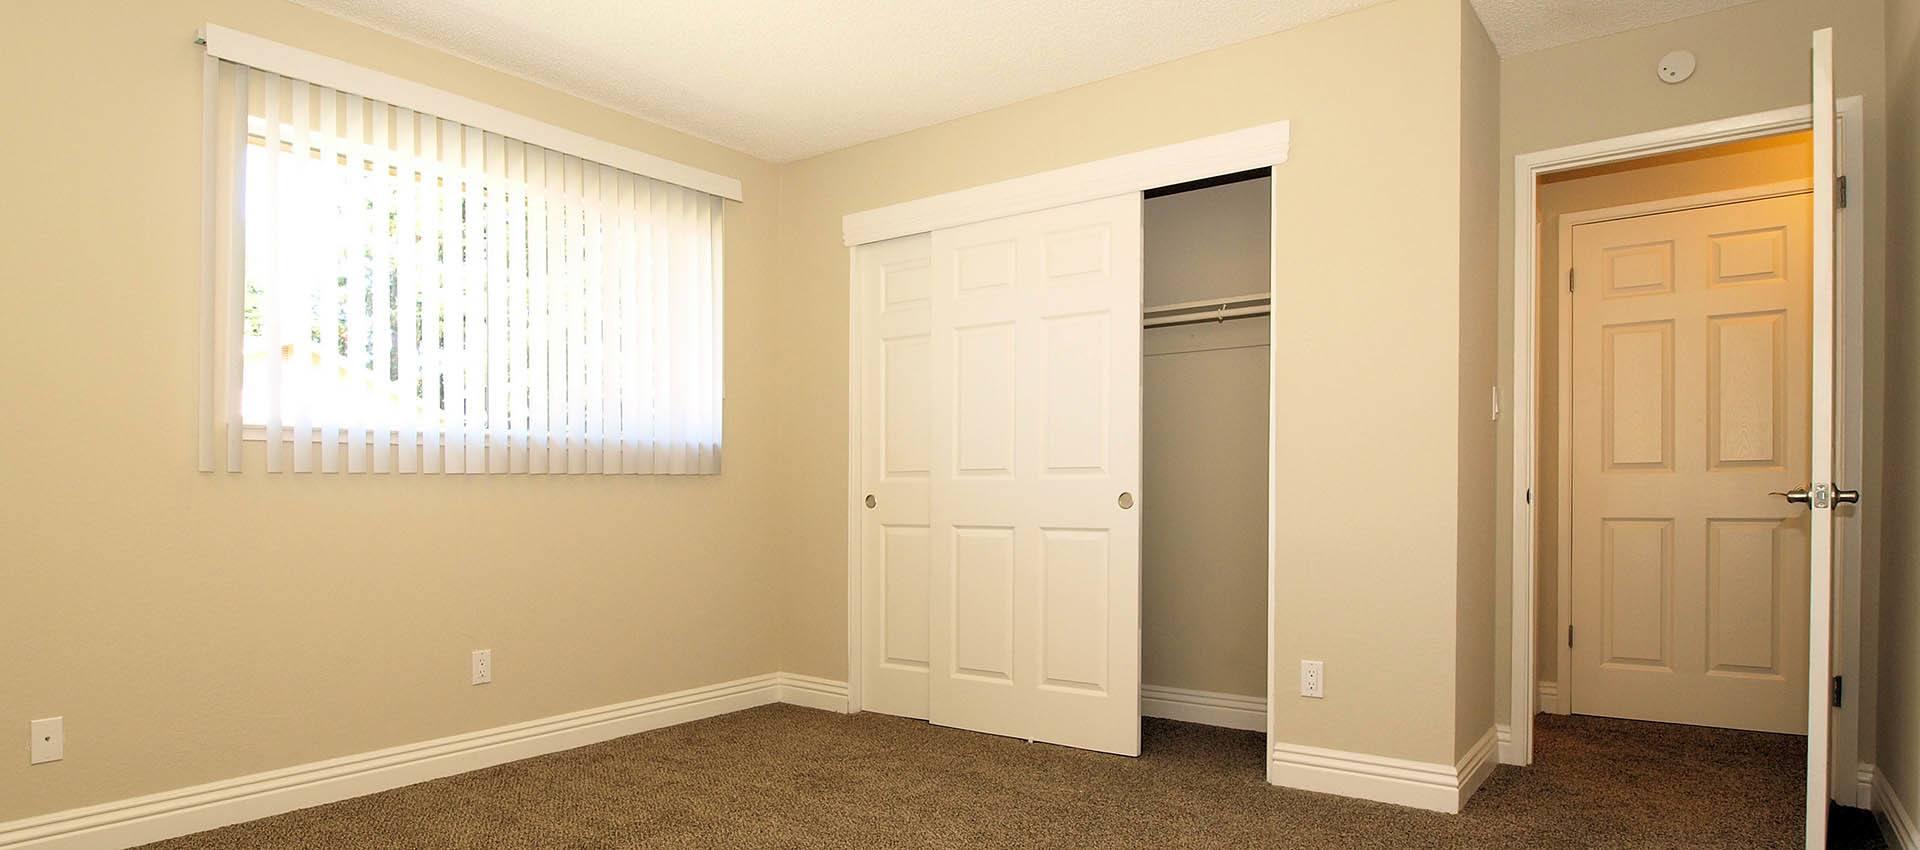 Bedroom at apartments in Santa Rosa, CA